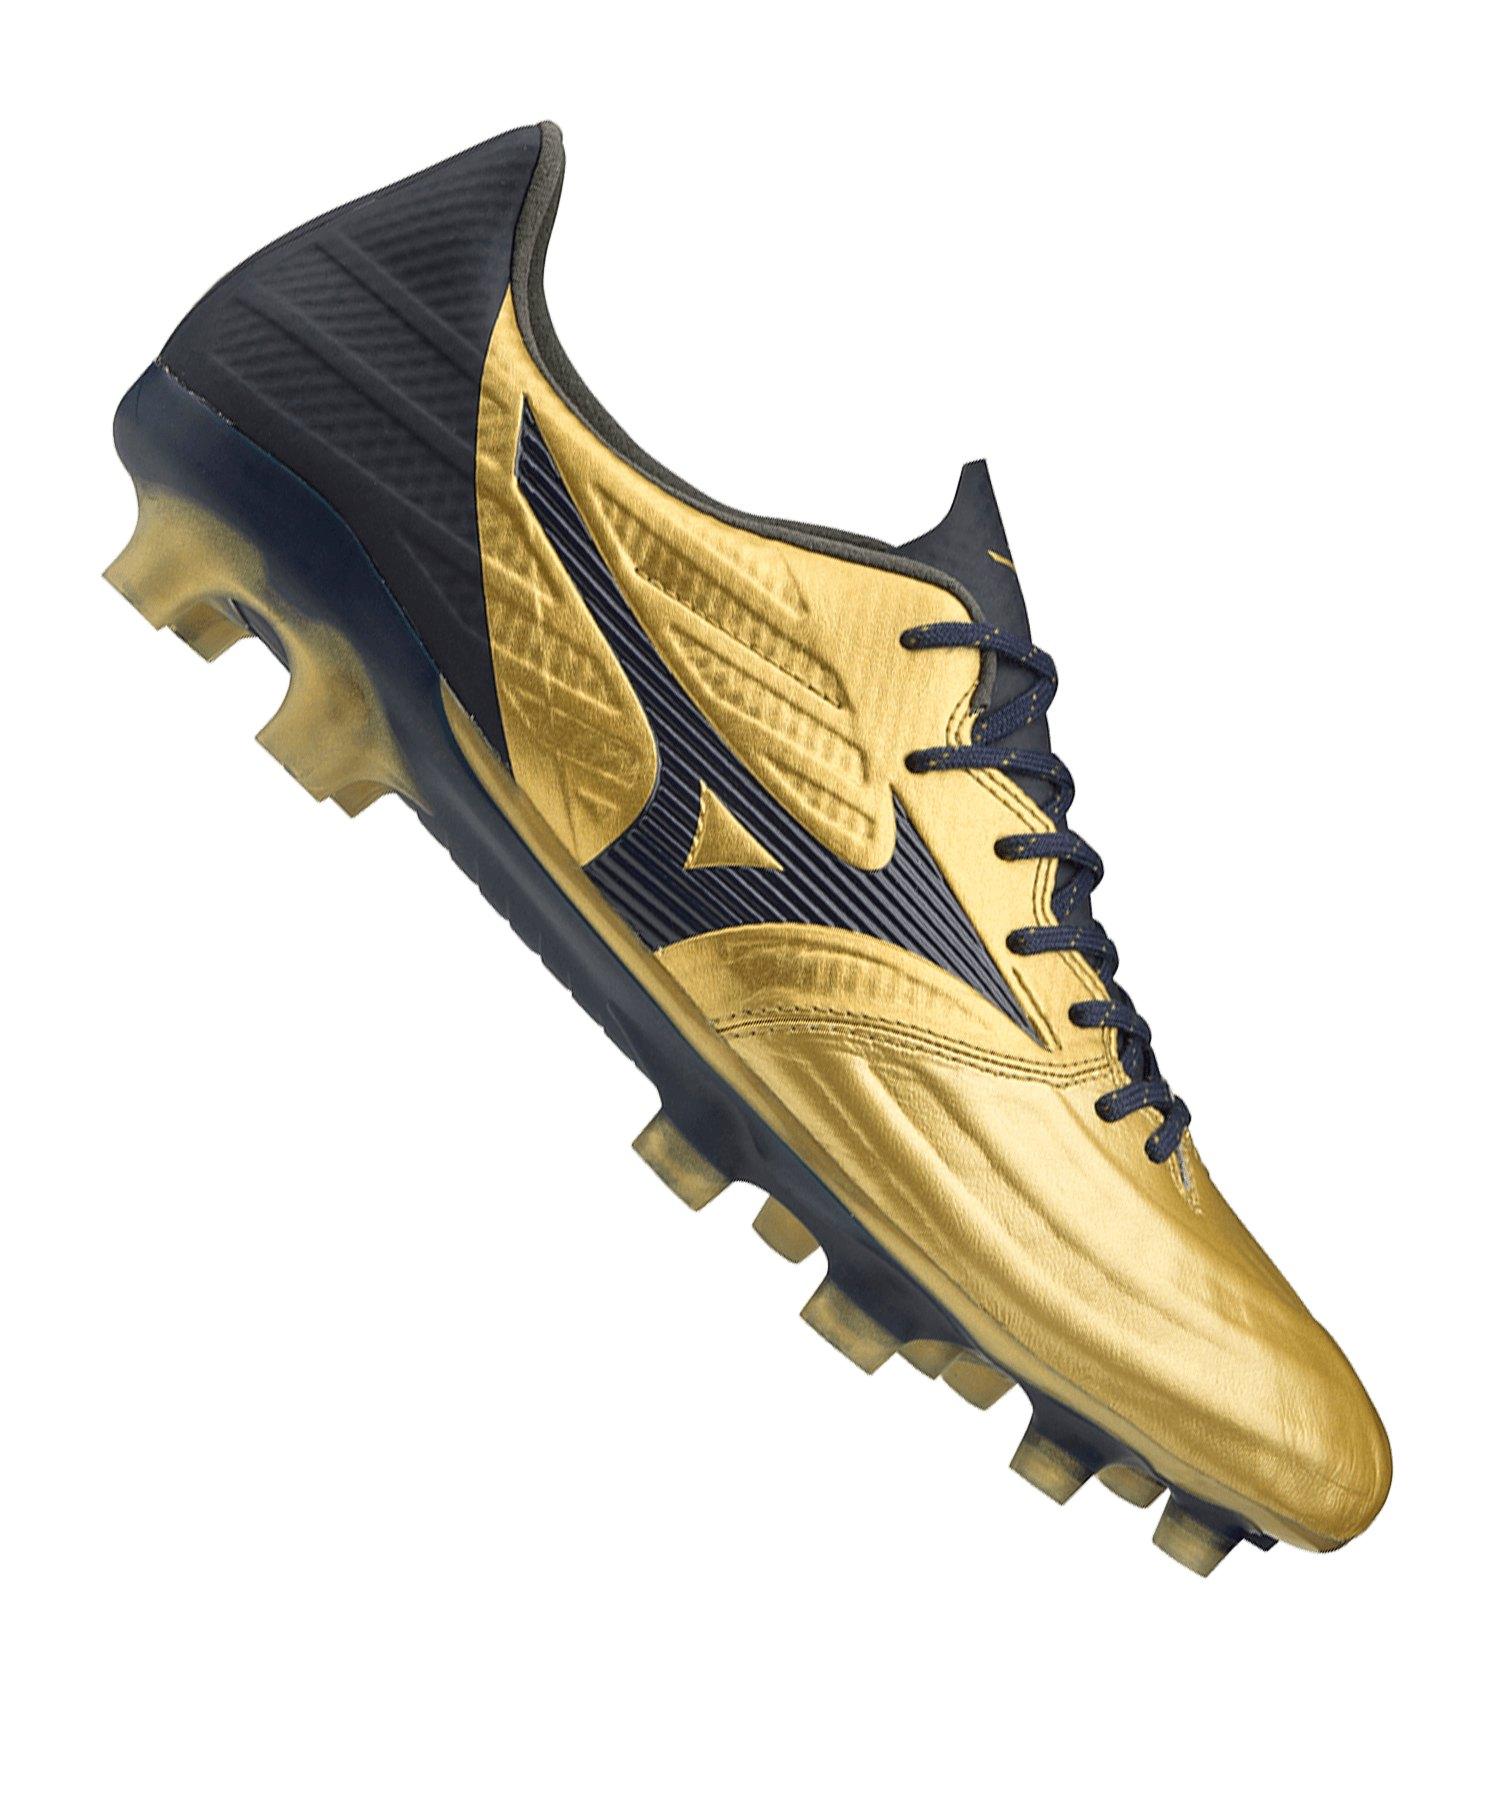 Mizuno Rebula 3 Elite FG Gold Blau F14 - gold